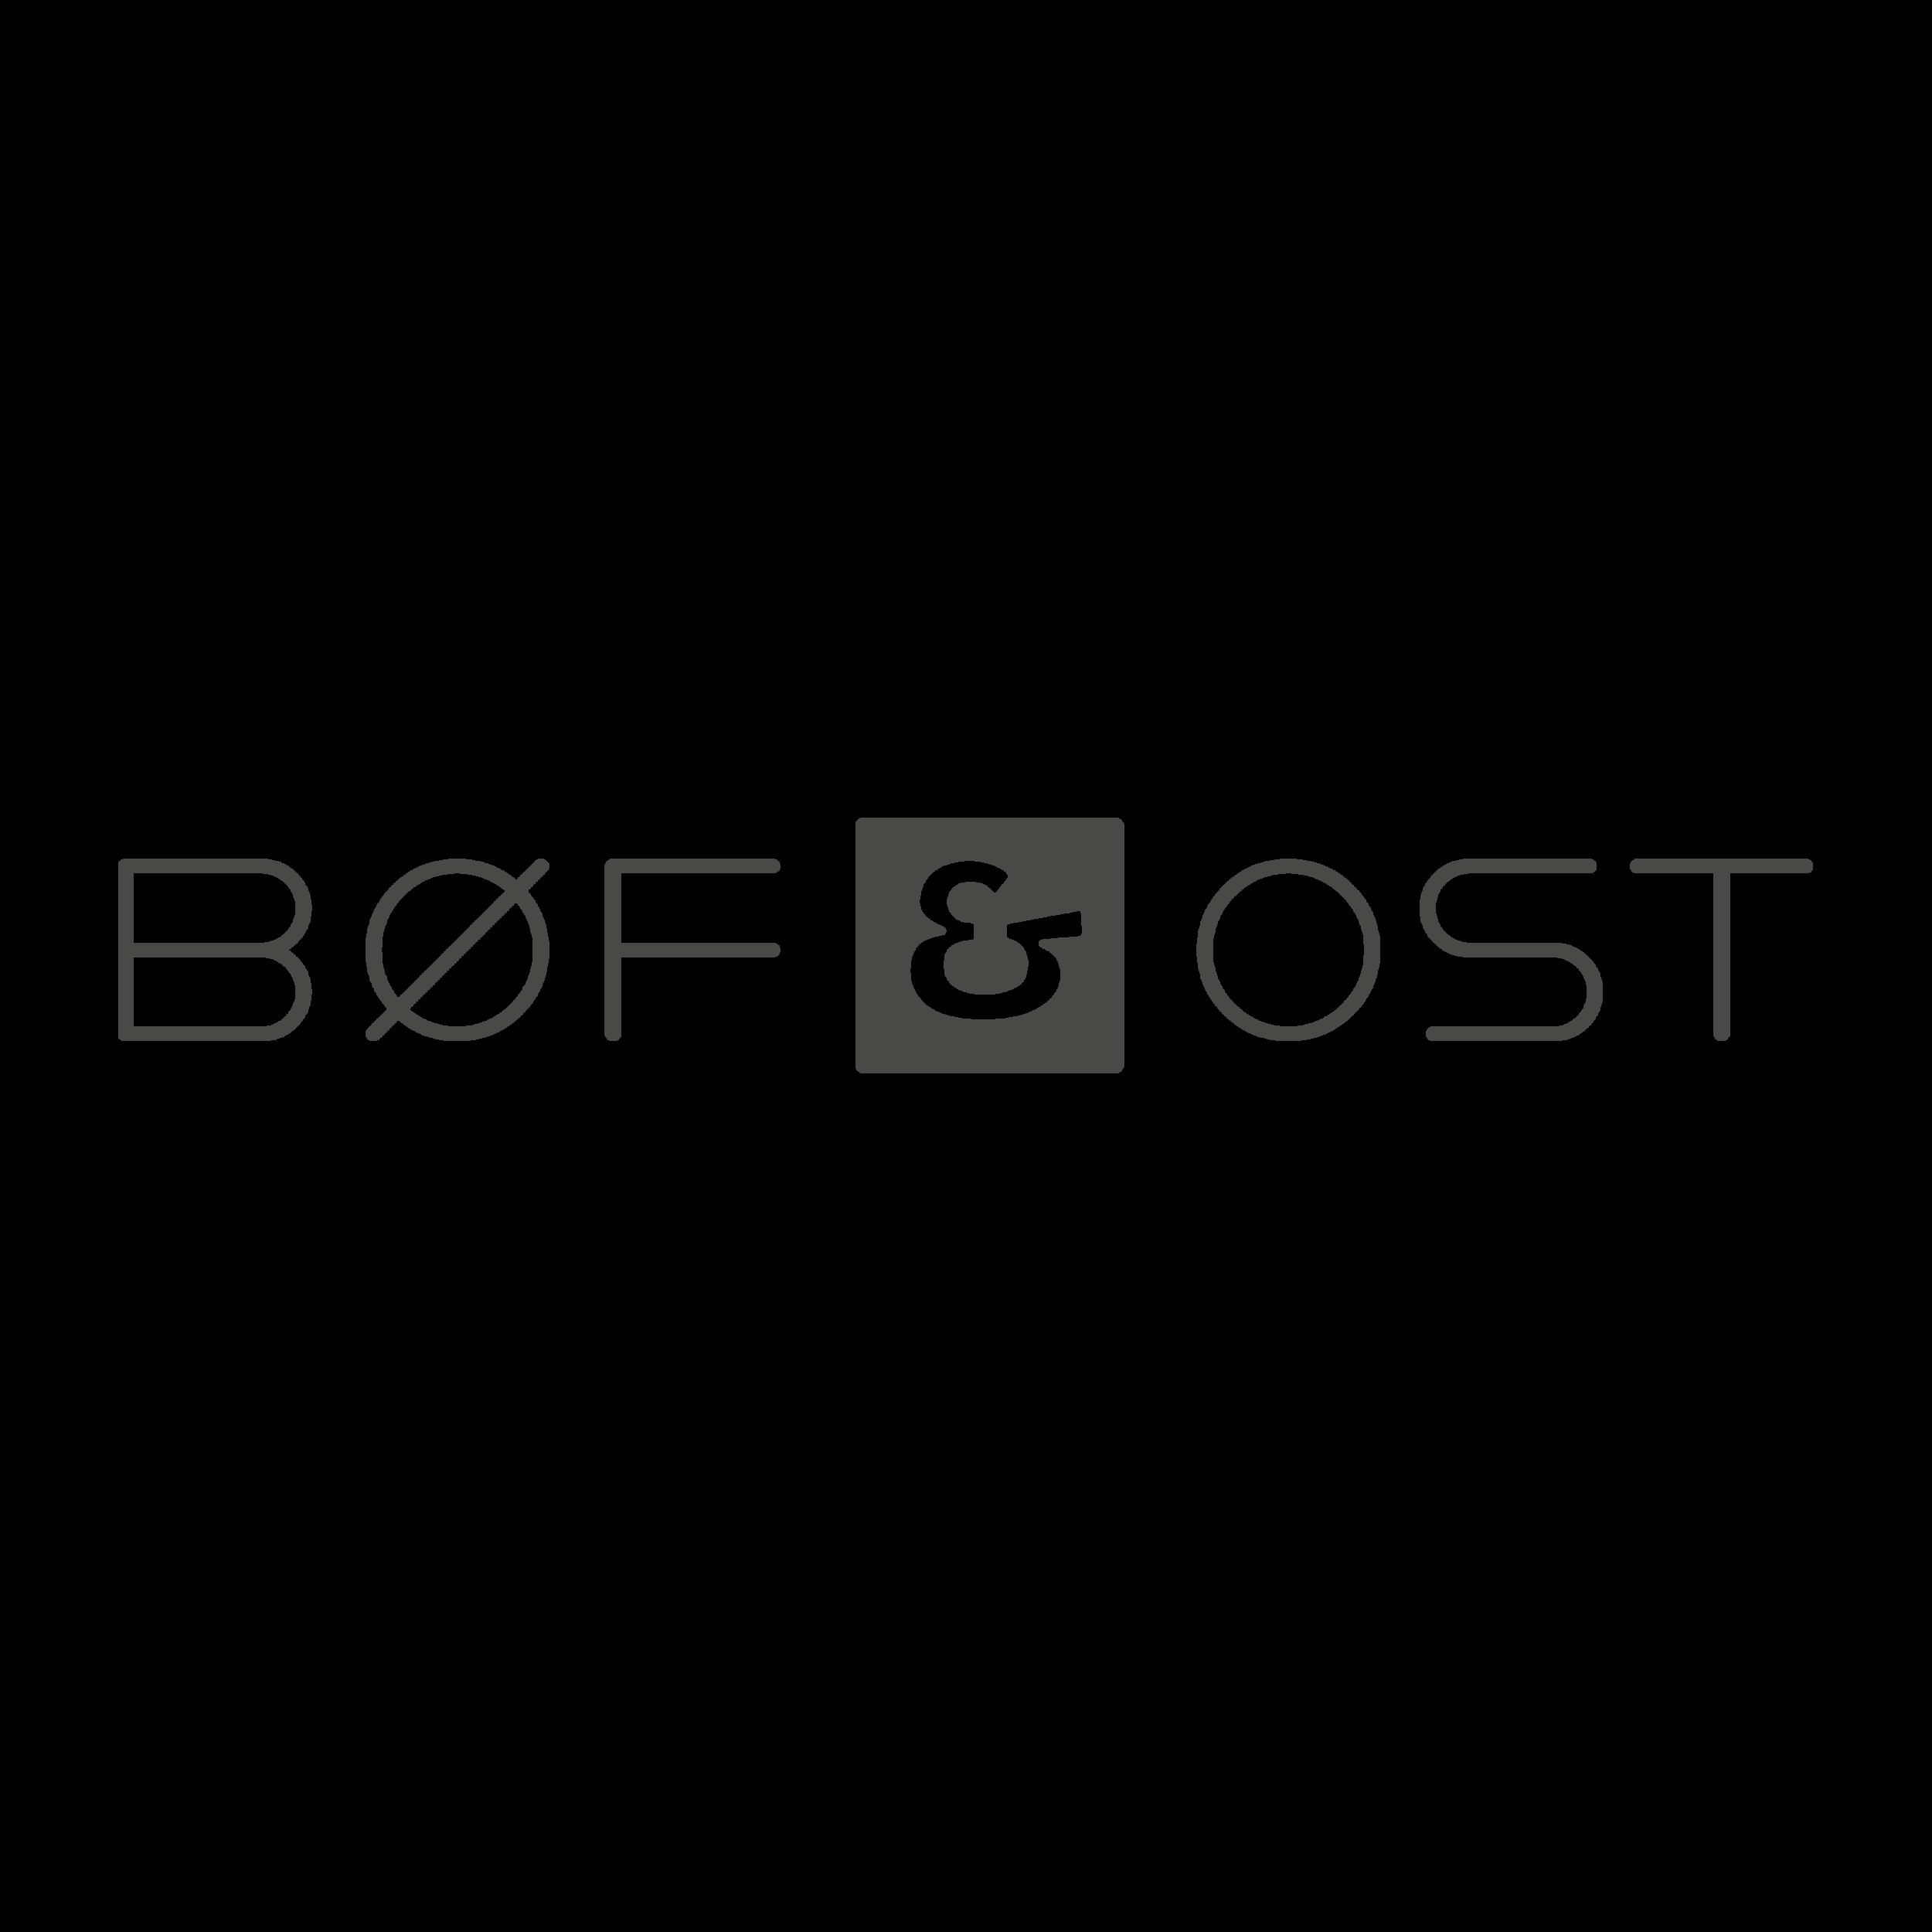 Bøf & Ost